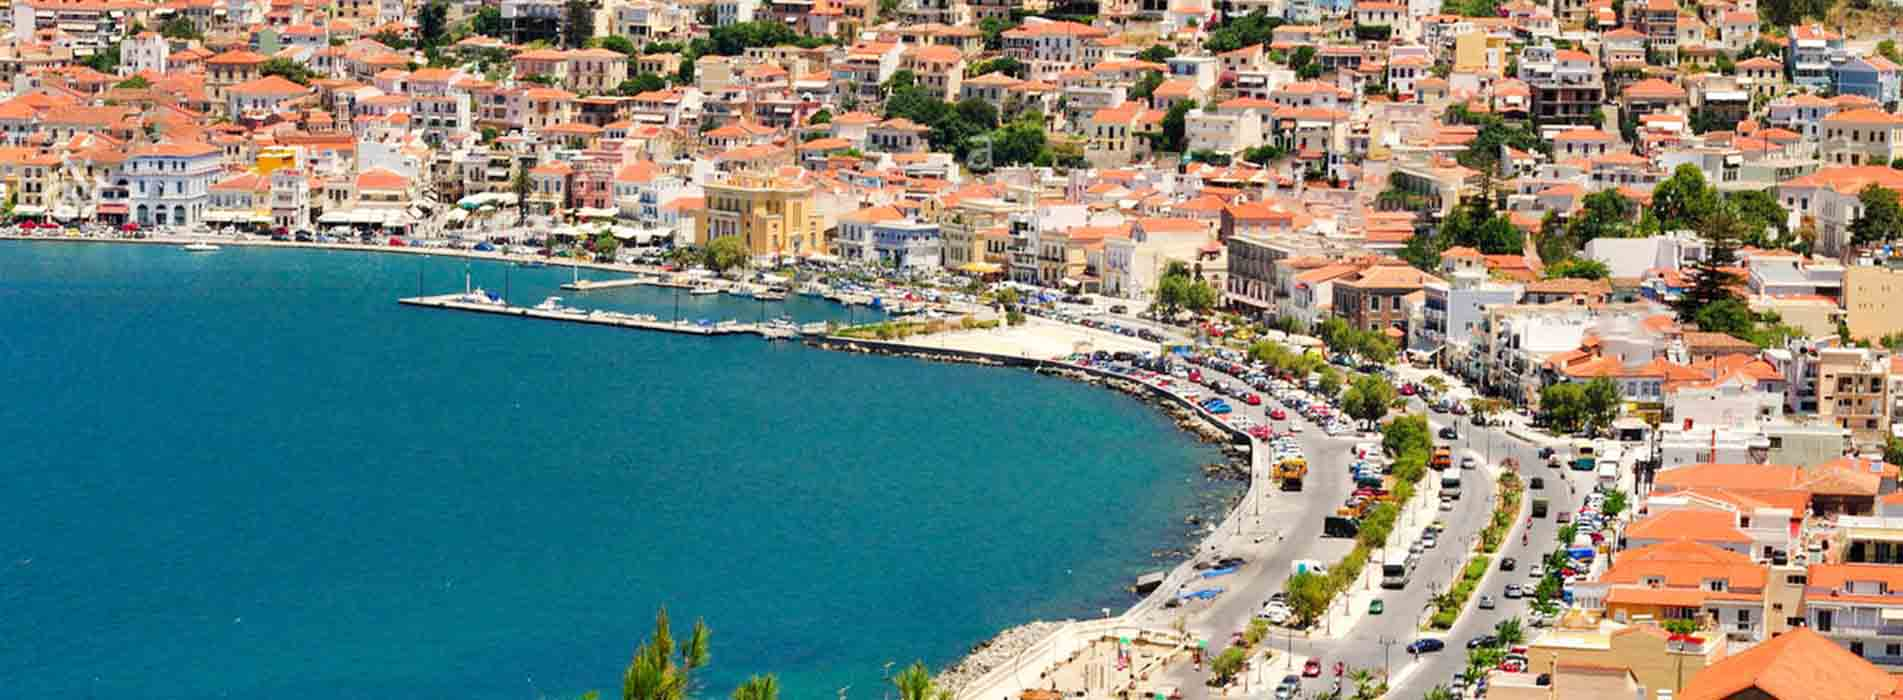 Greece - Samos 2 (main)